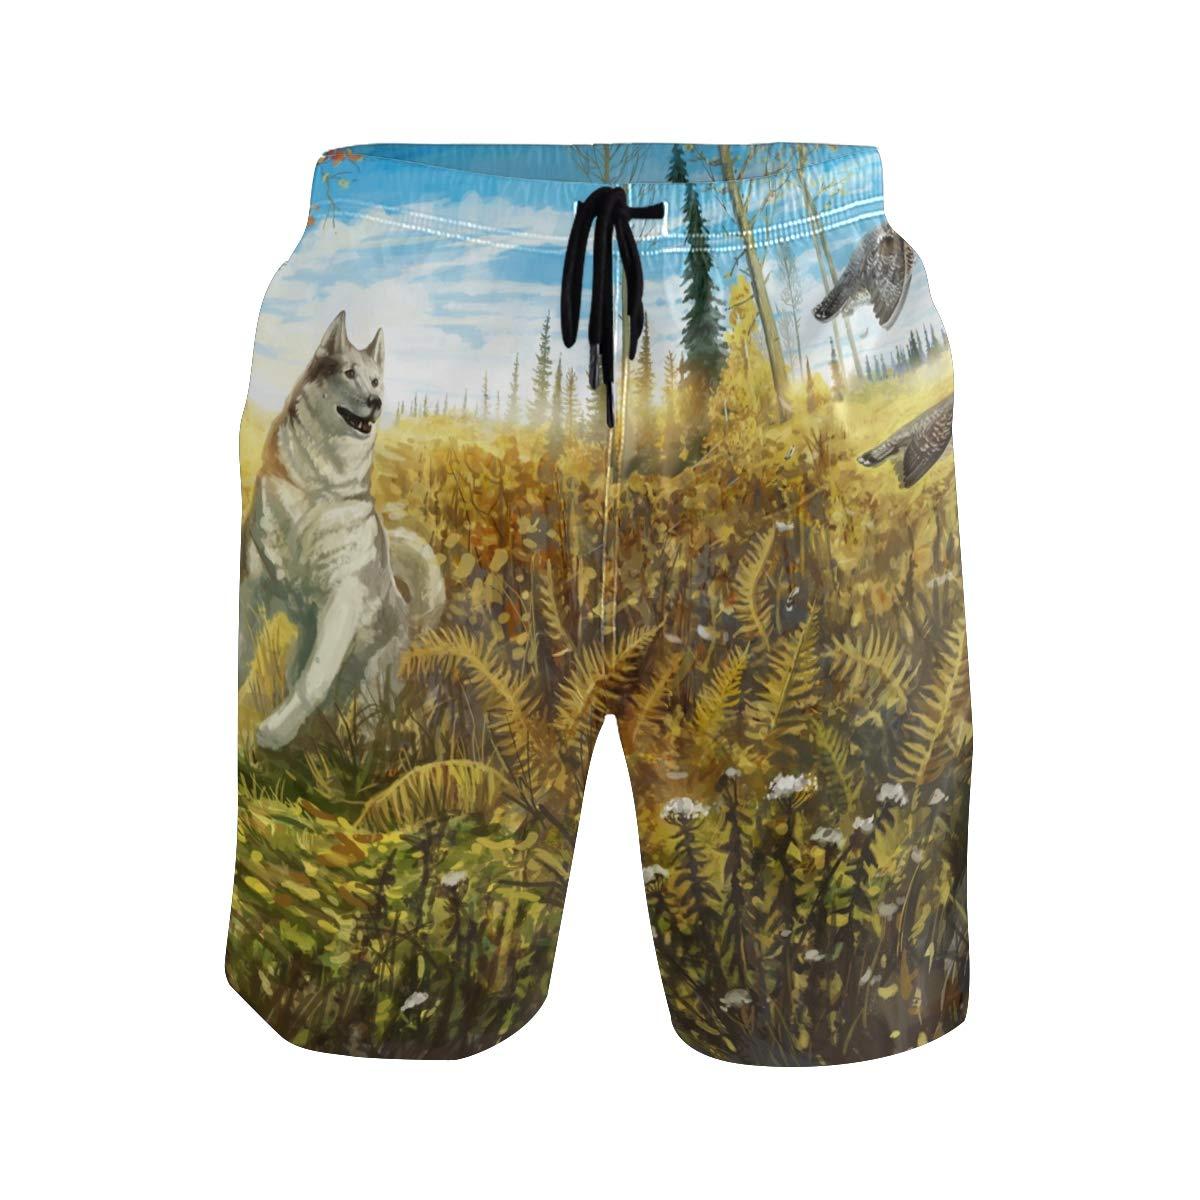 Mens Beach Swim Trunks Forest Bird Dog Boxer Swimsuit Underwear Board Shorts with Pocket